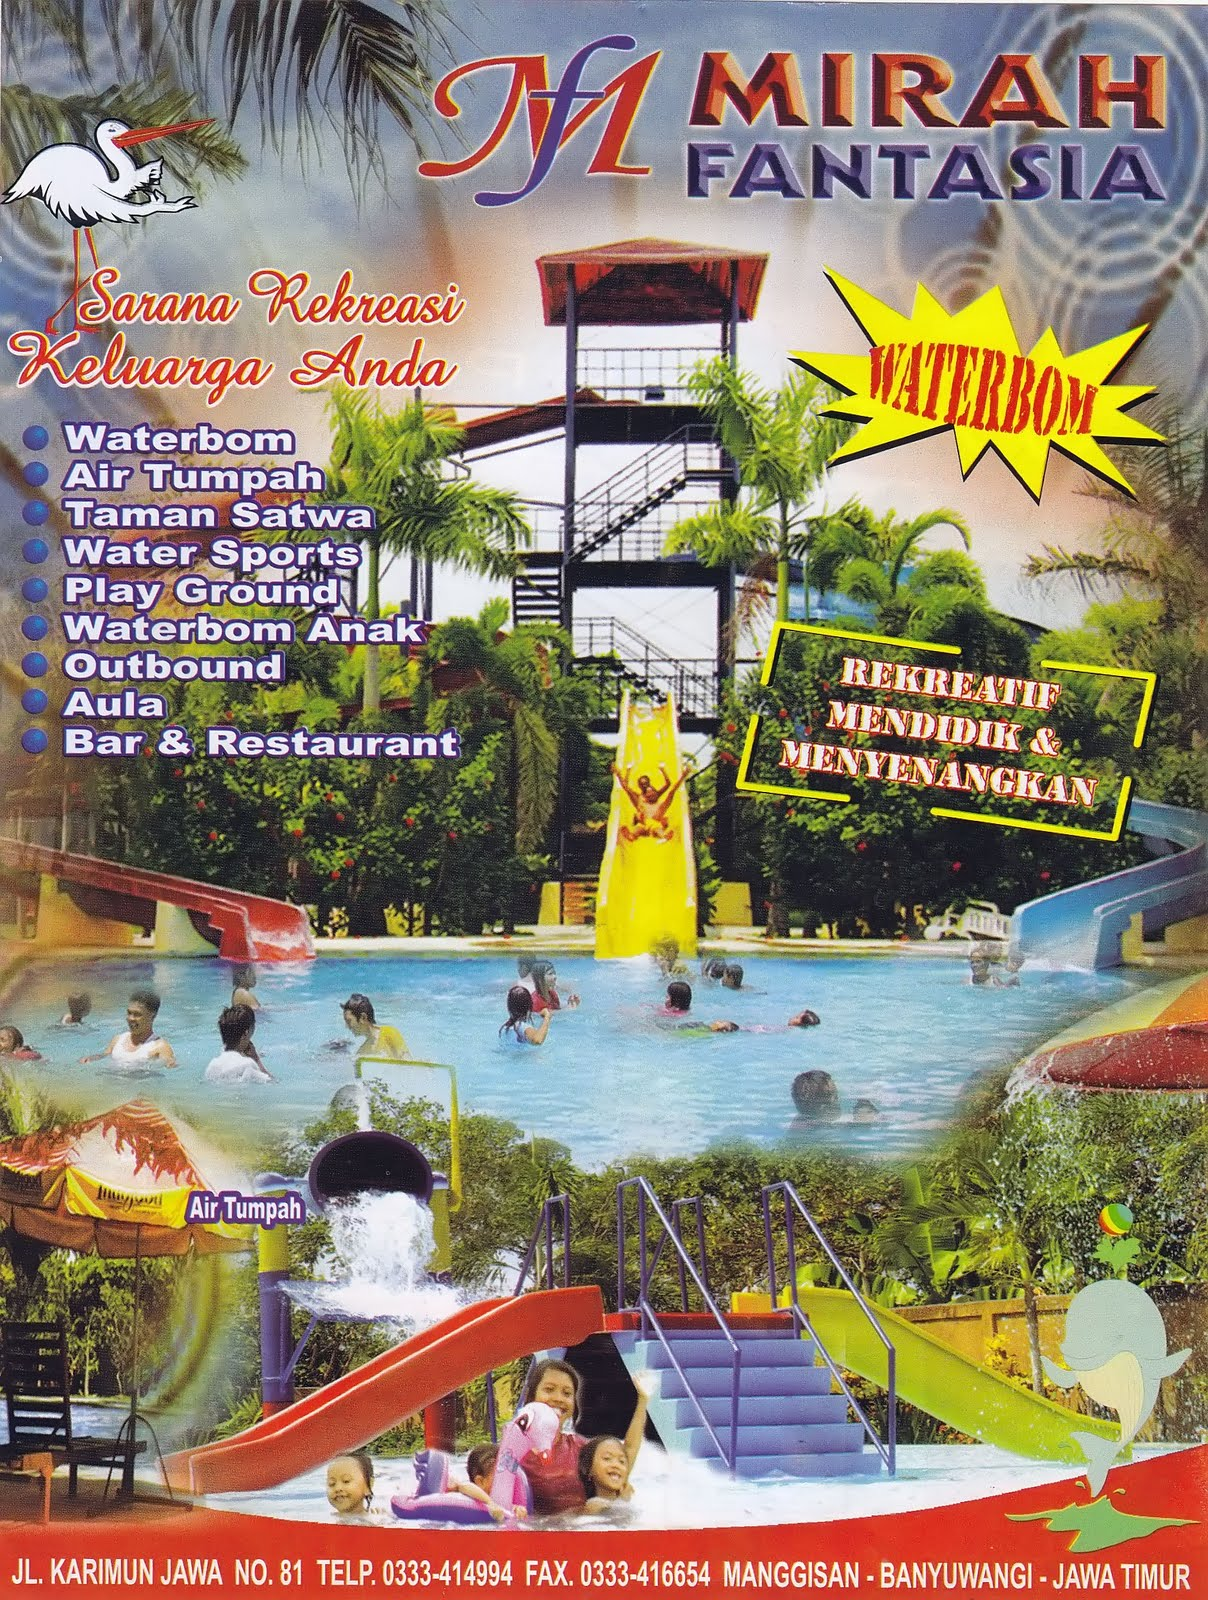 Tempat Wisata Banyuwangi Cocok Liburan Alamat Jalan Karimun Jawa 81